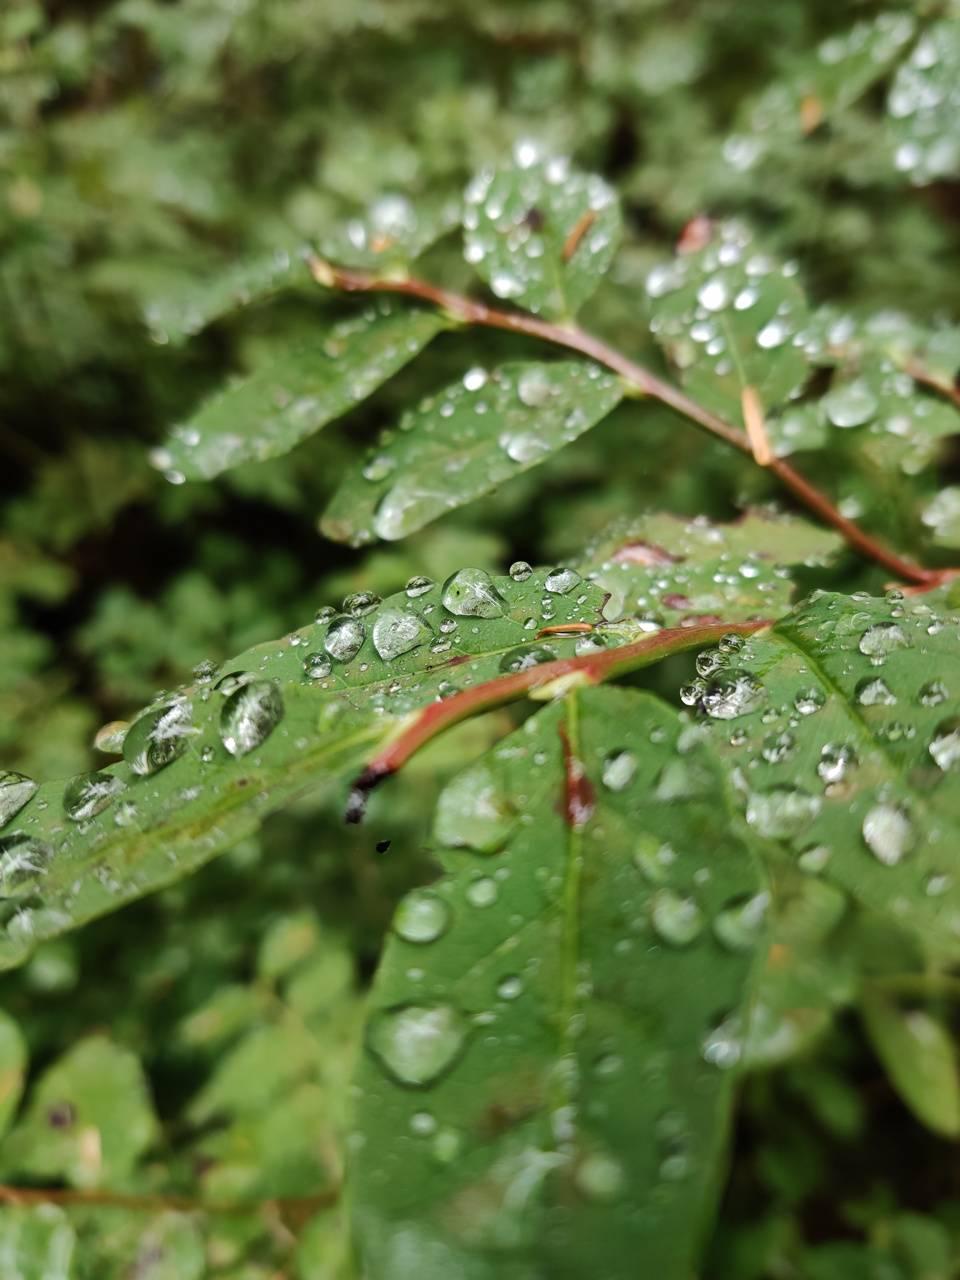 Post rainsrorm